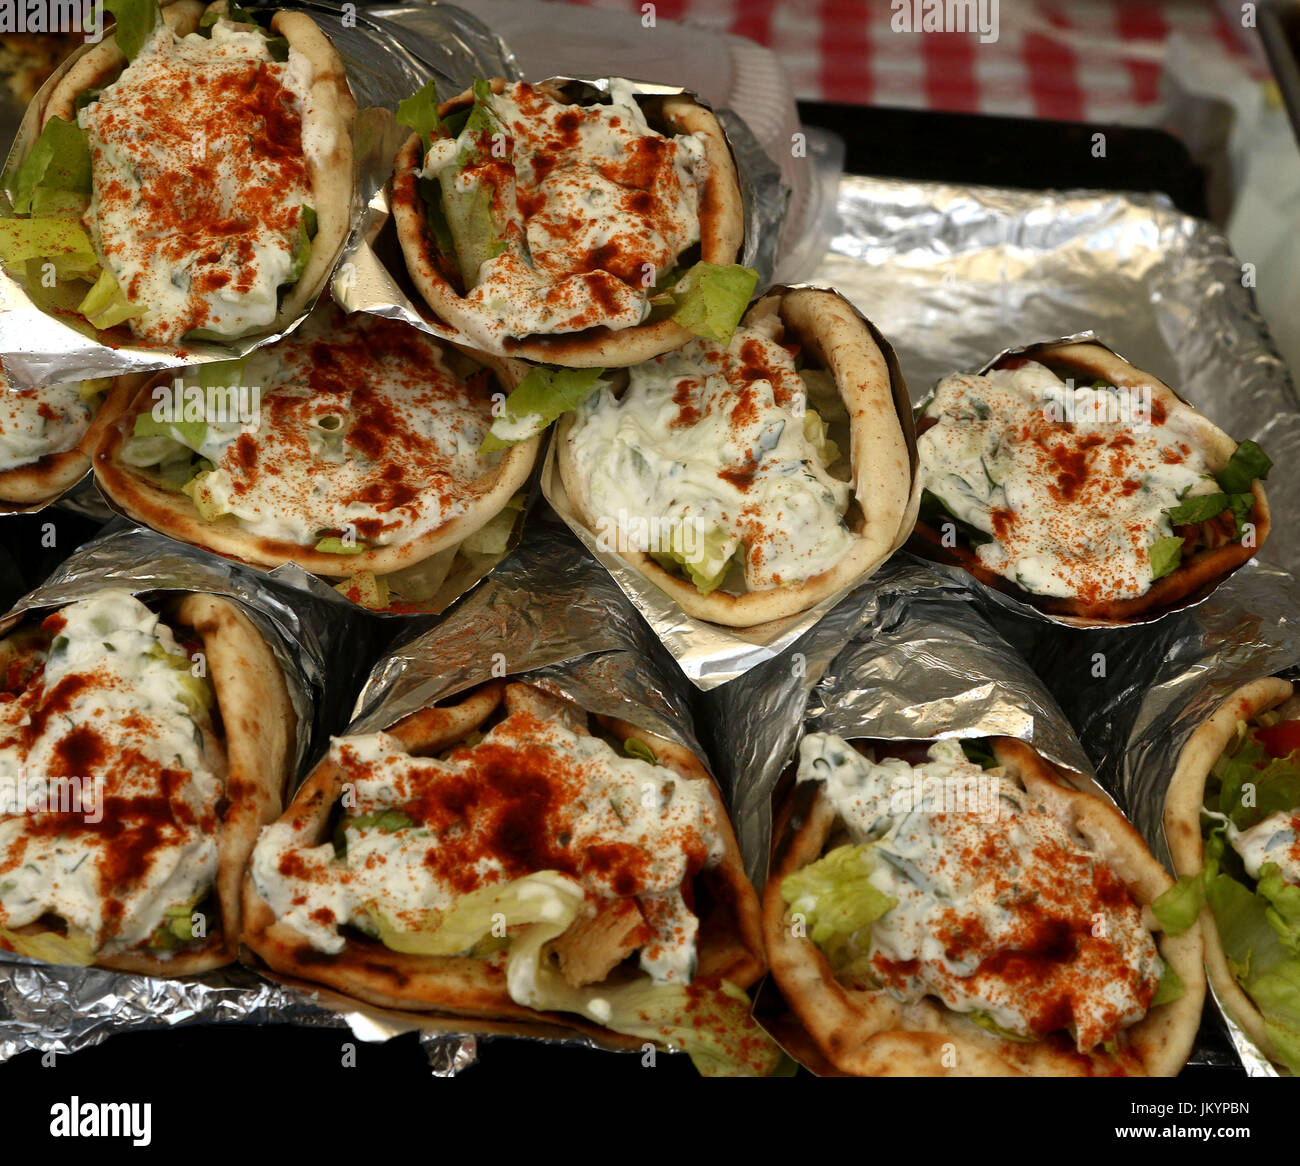 Enveloppements grec fait sauce tzatziki, feta, paprika, salade et poulet Photo Stock